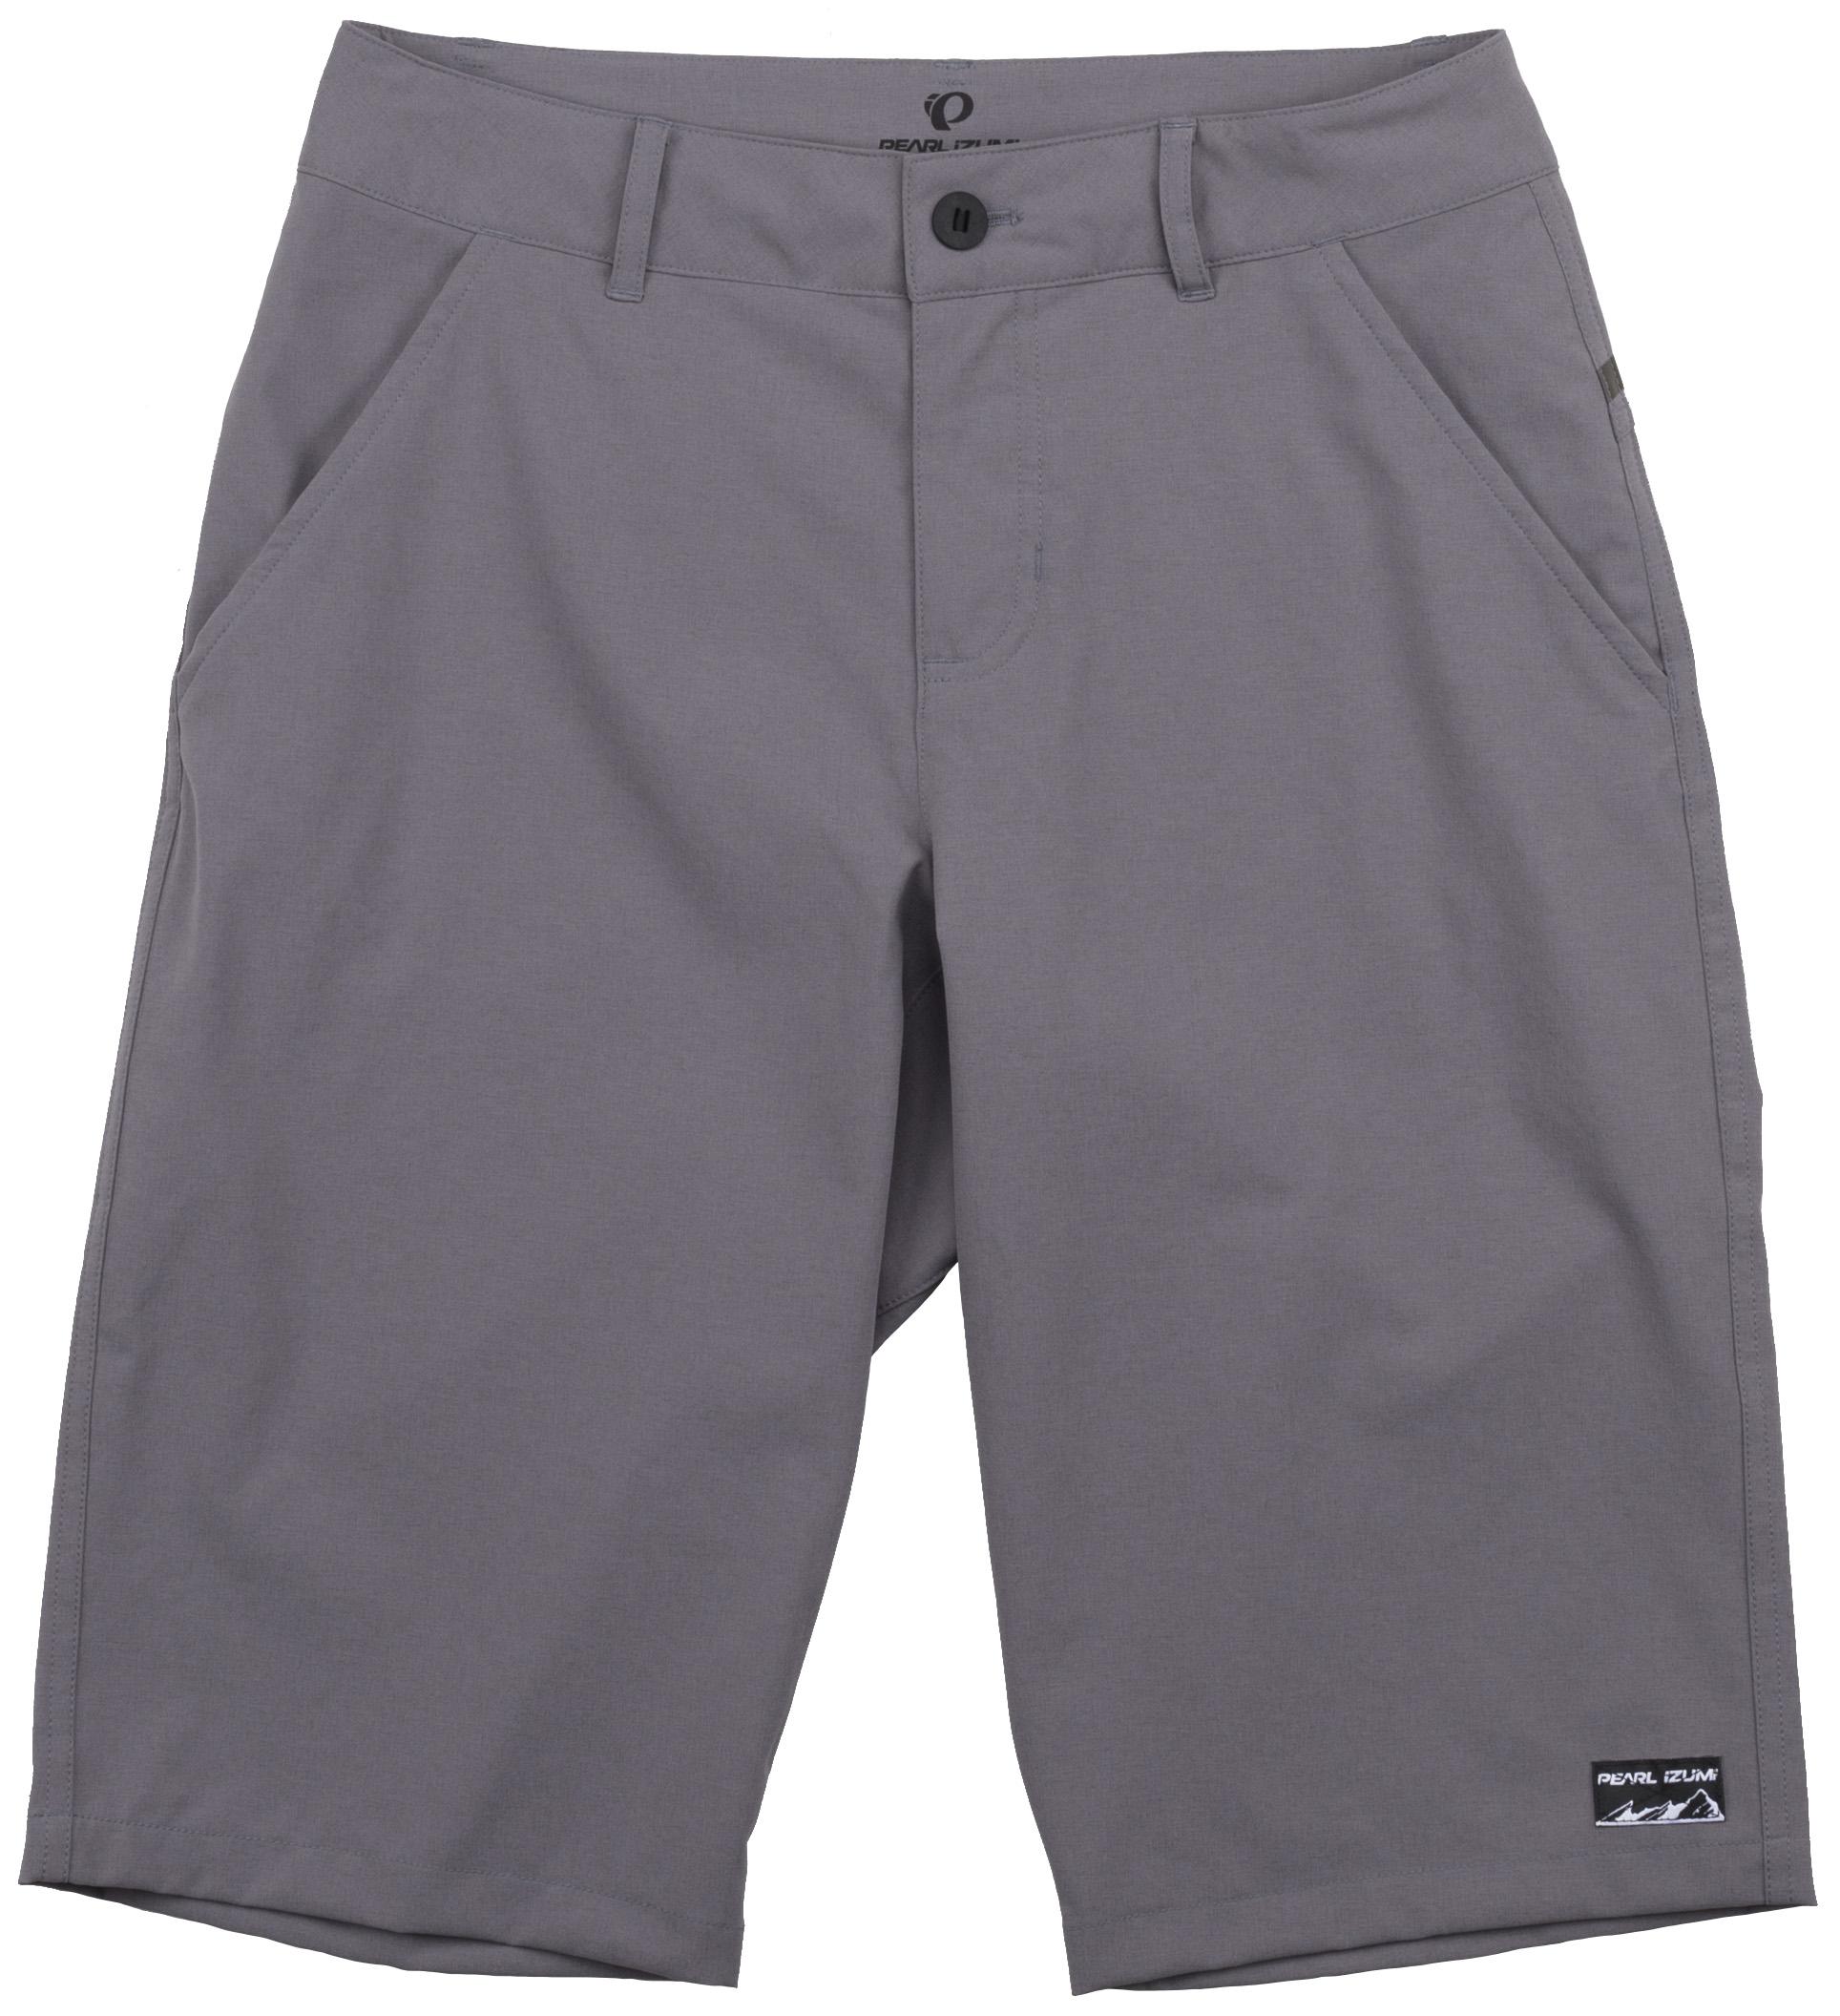 Pearl Izumi |  Boardwalk Shorts Men's Size 28 in Smoked Pearl